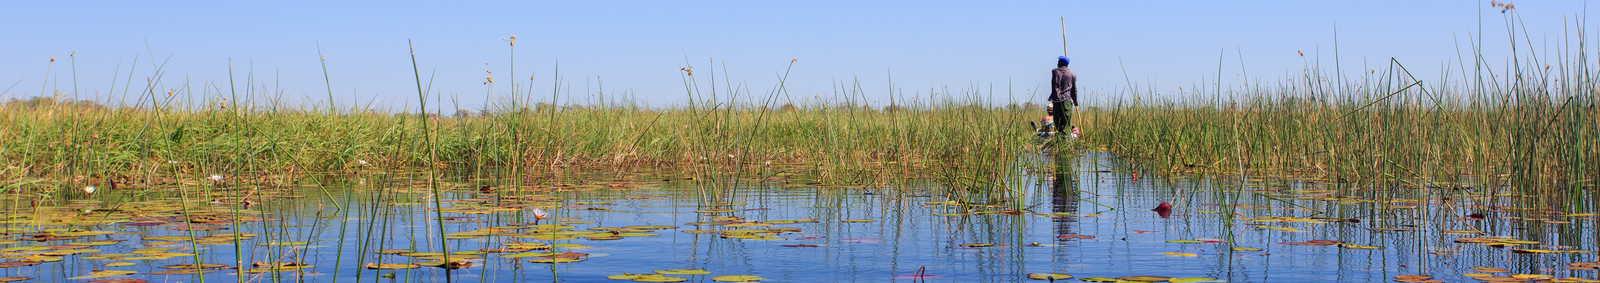 Traditional mokoro canoe in The Okavango Delta, Maun, Botswana